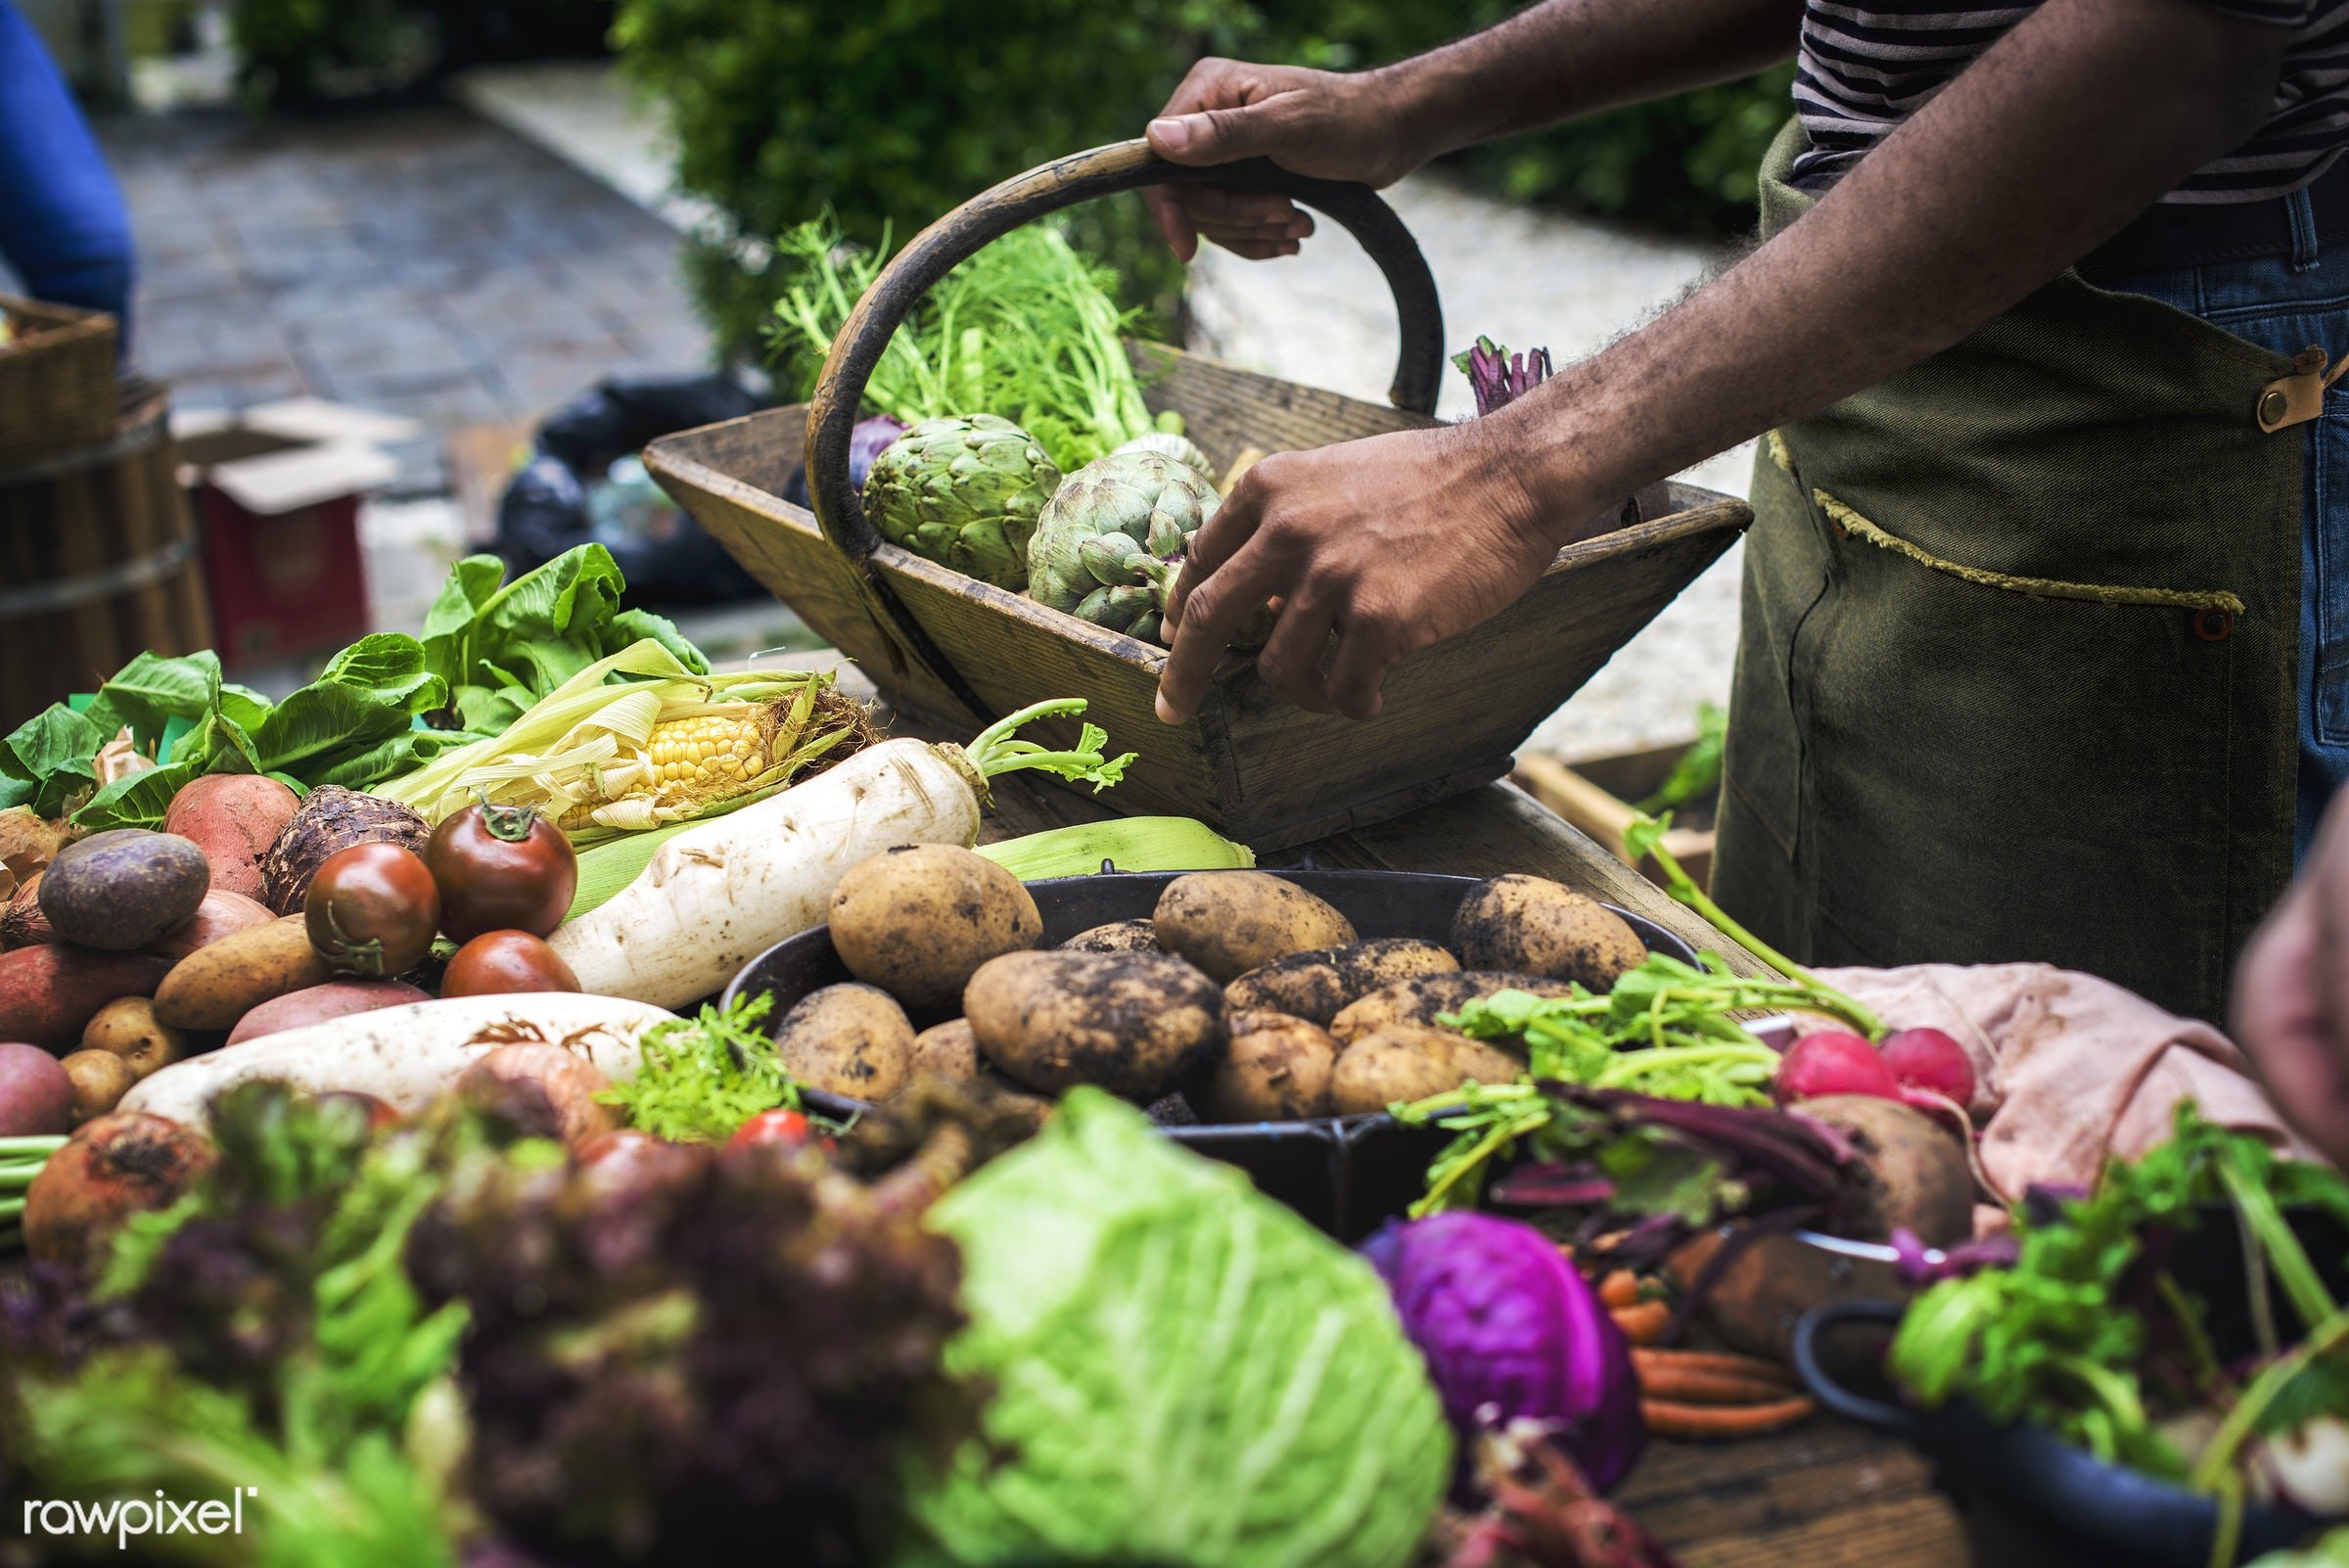 cuisine, variation, selecting, gastronomy, type, kind, ingredients, hands, buying, veggie, gourmet, selling, wooden bucket,...